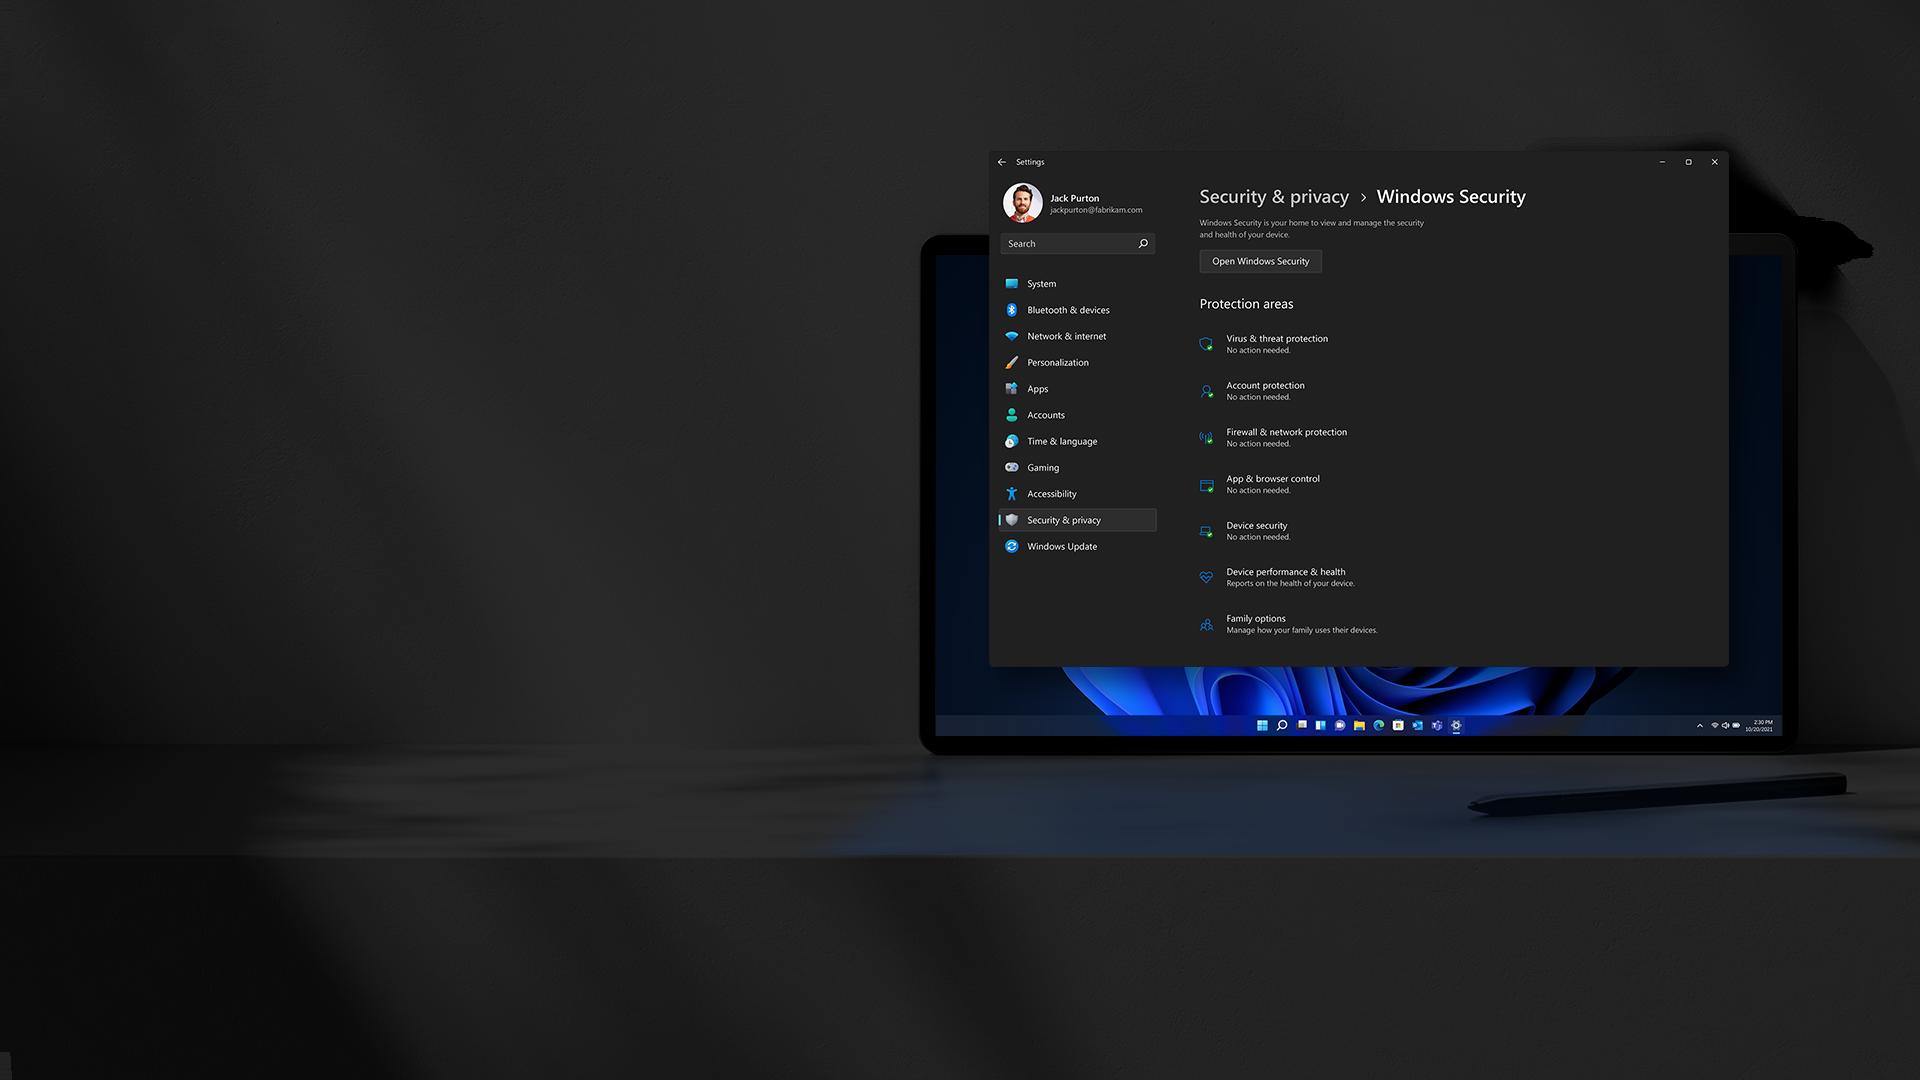 Windows 11 security screen on a Windows device